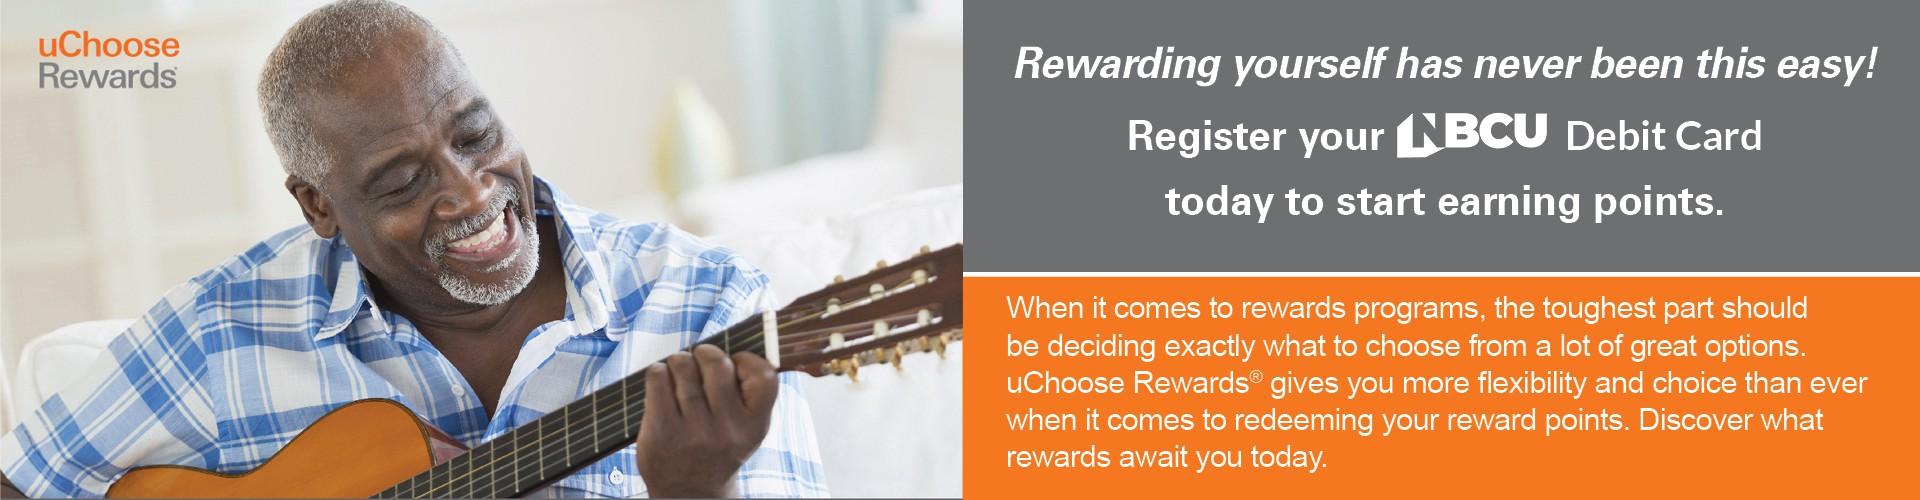 uChoose Rewards®